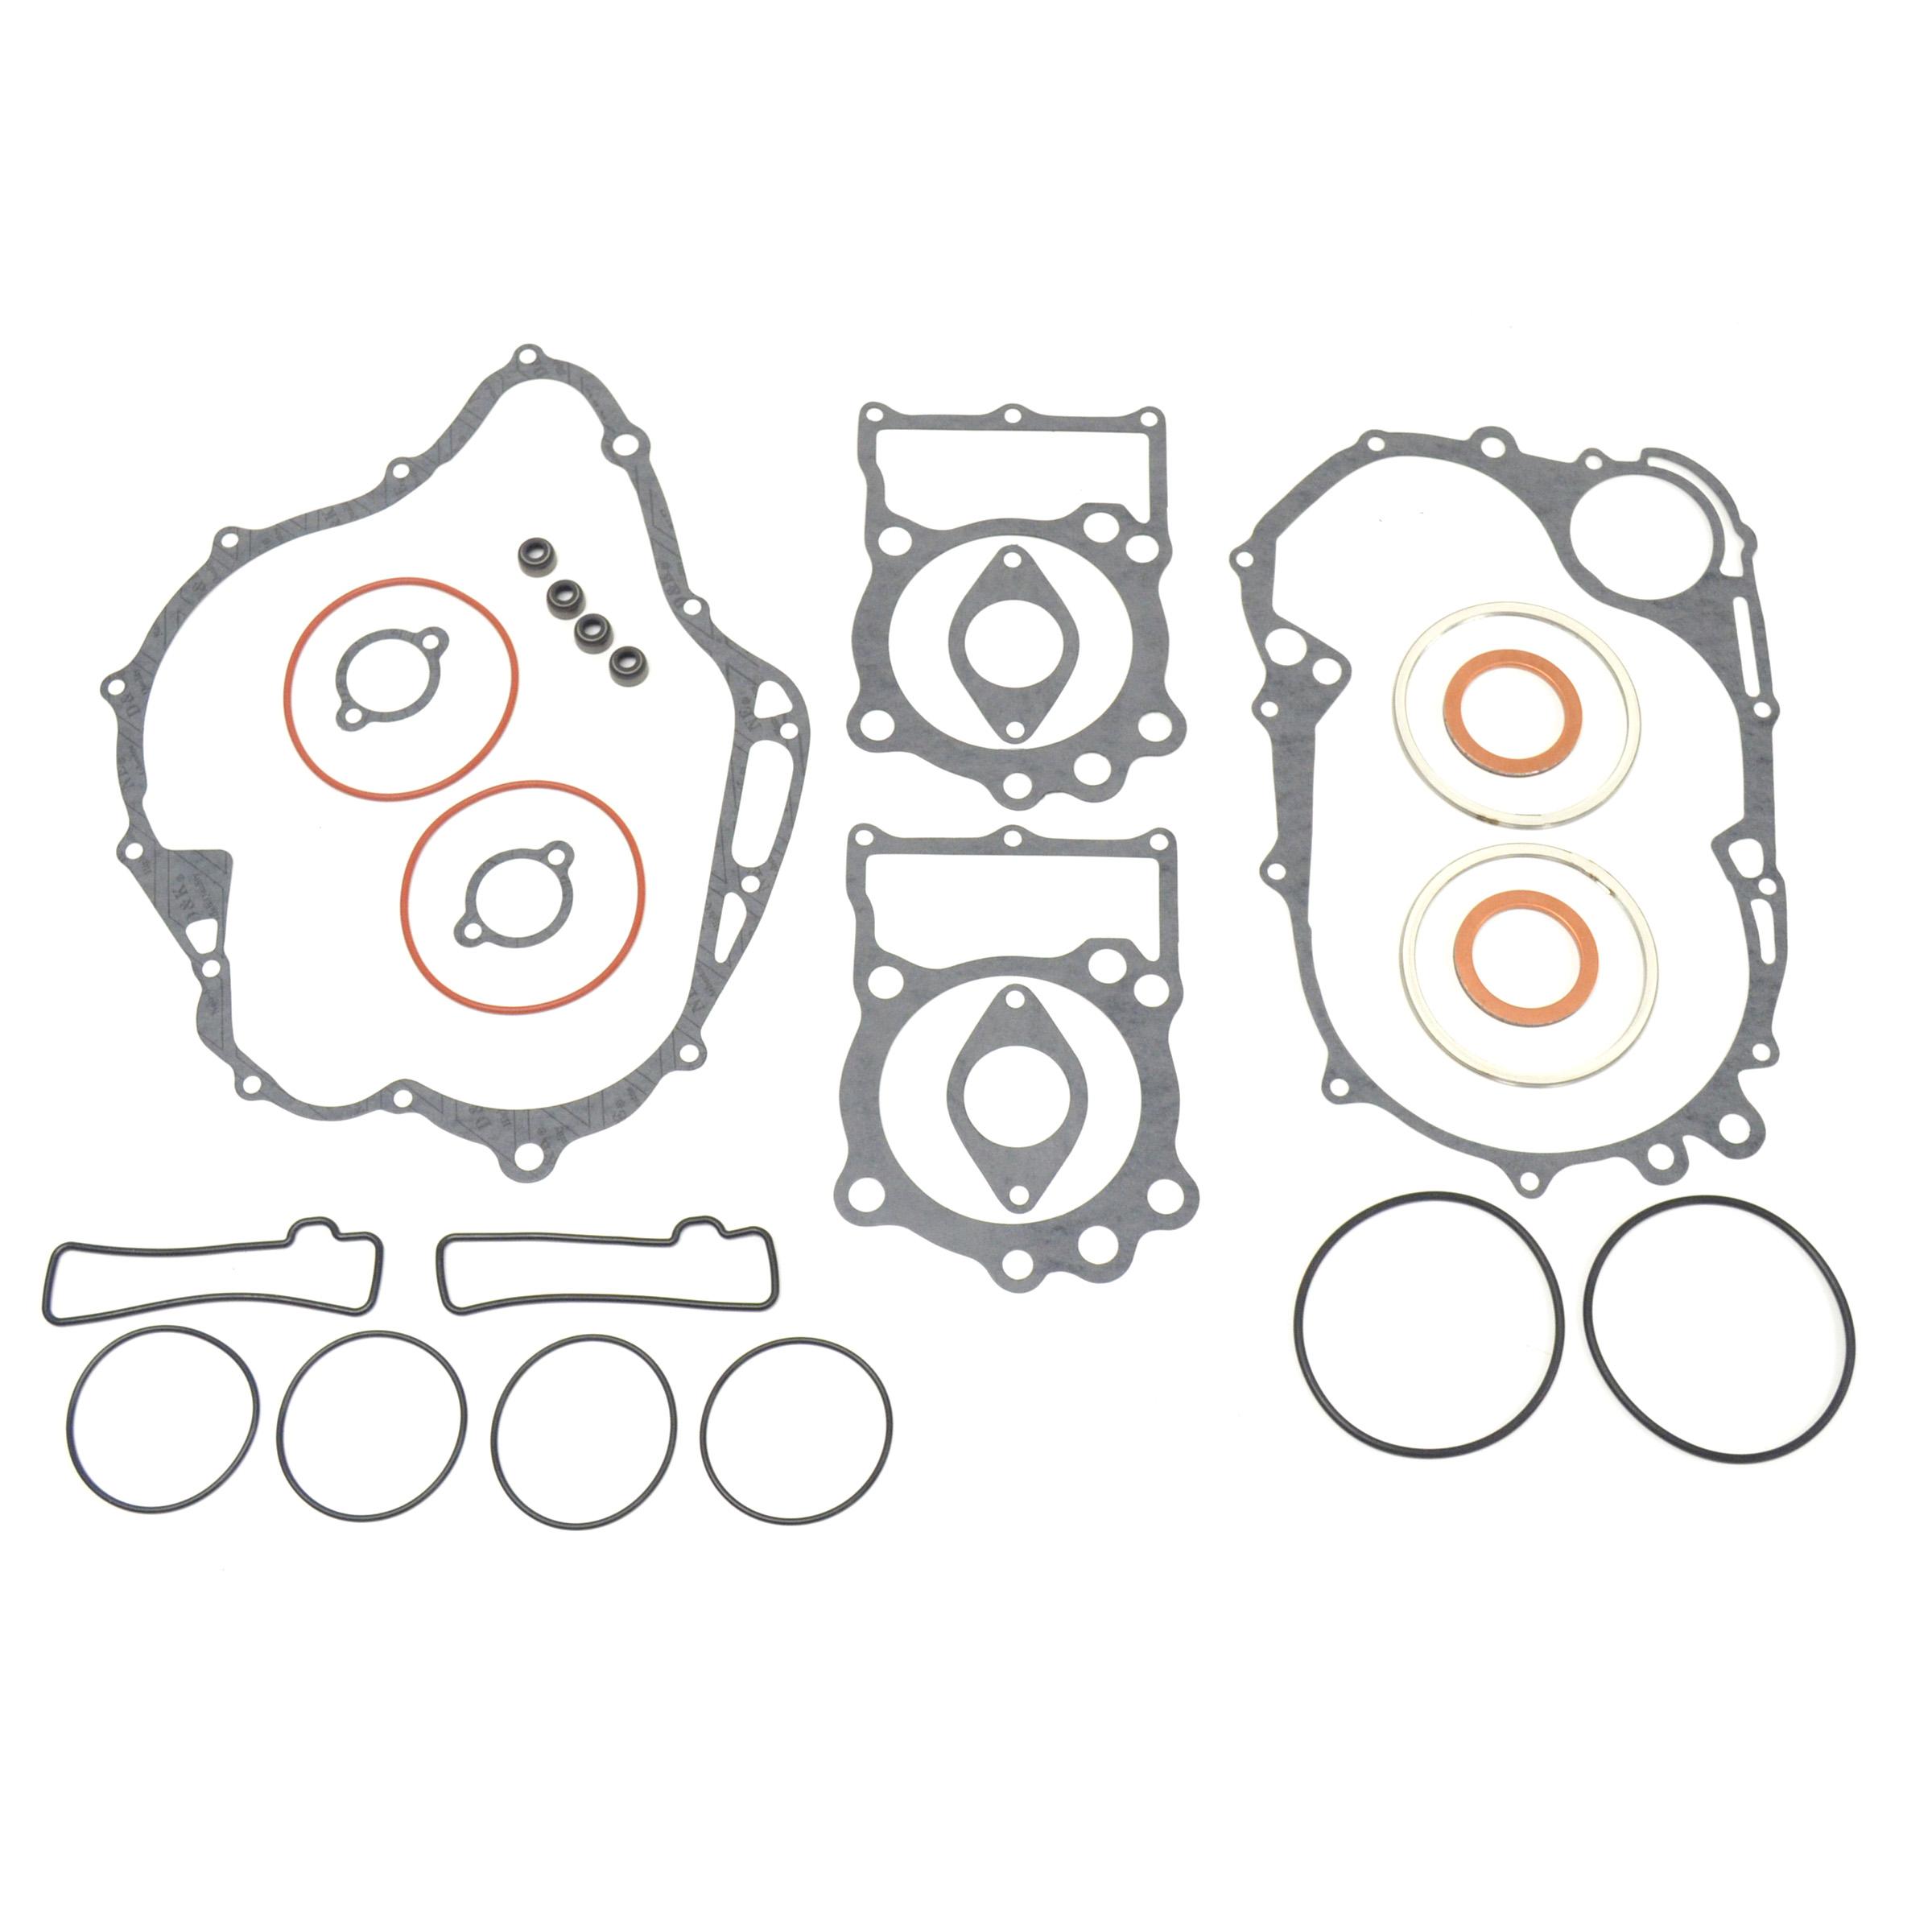 Yamaha Virago 750 Top Bottom End Complete Engine Gasket